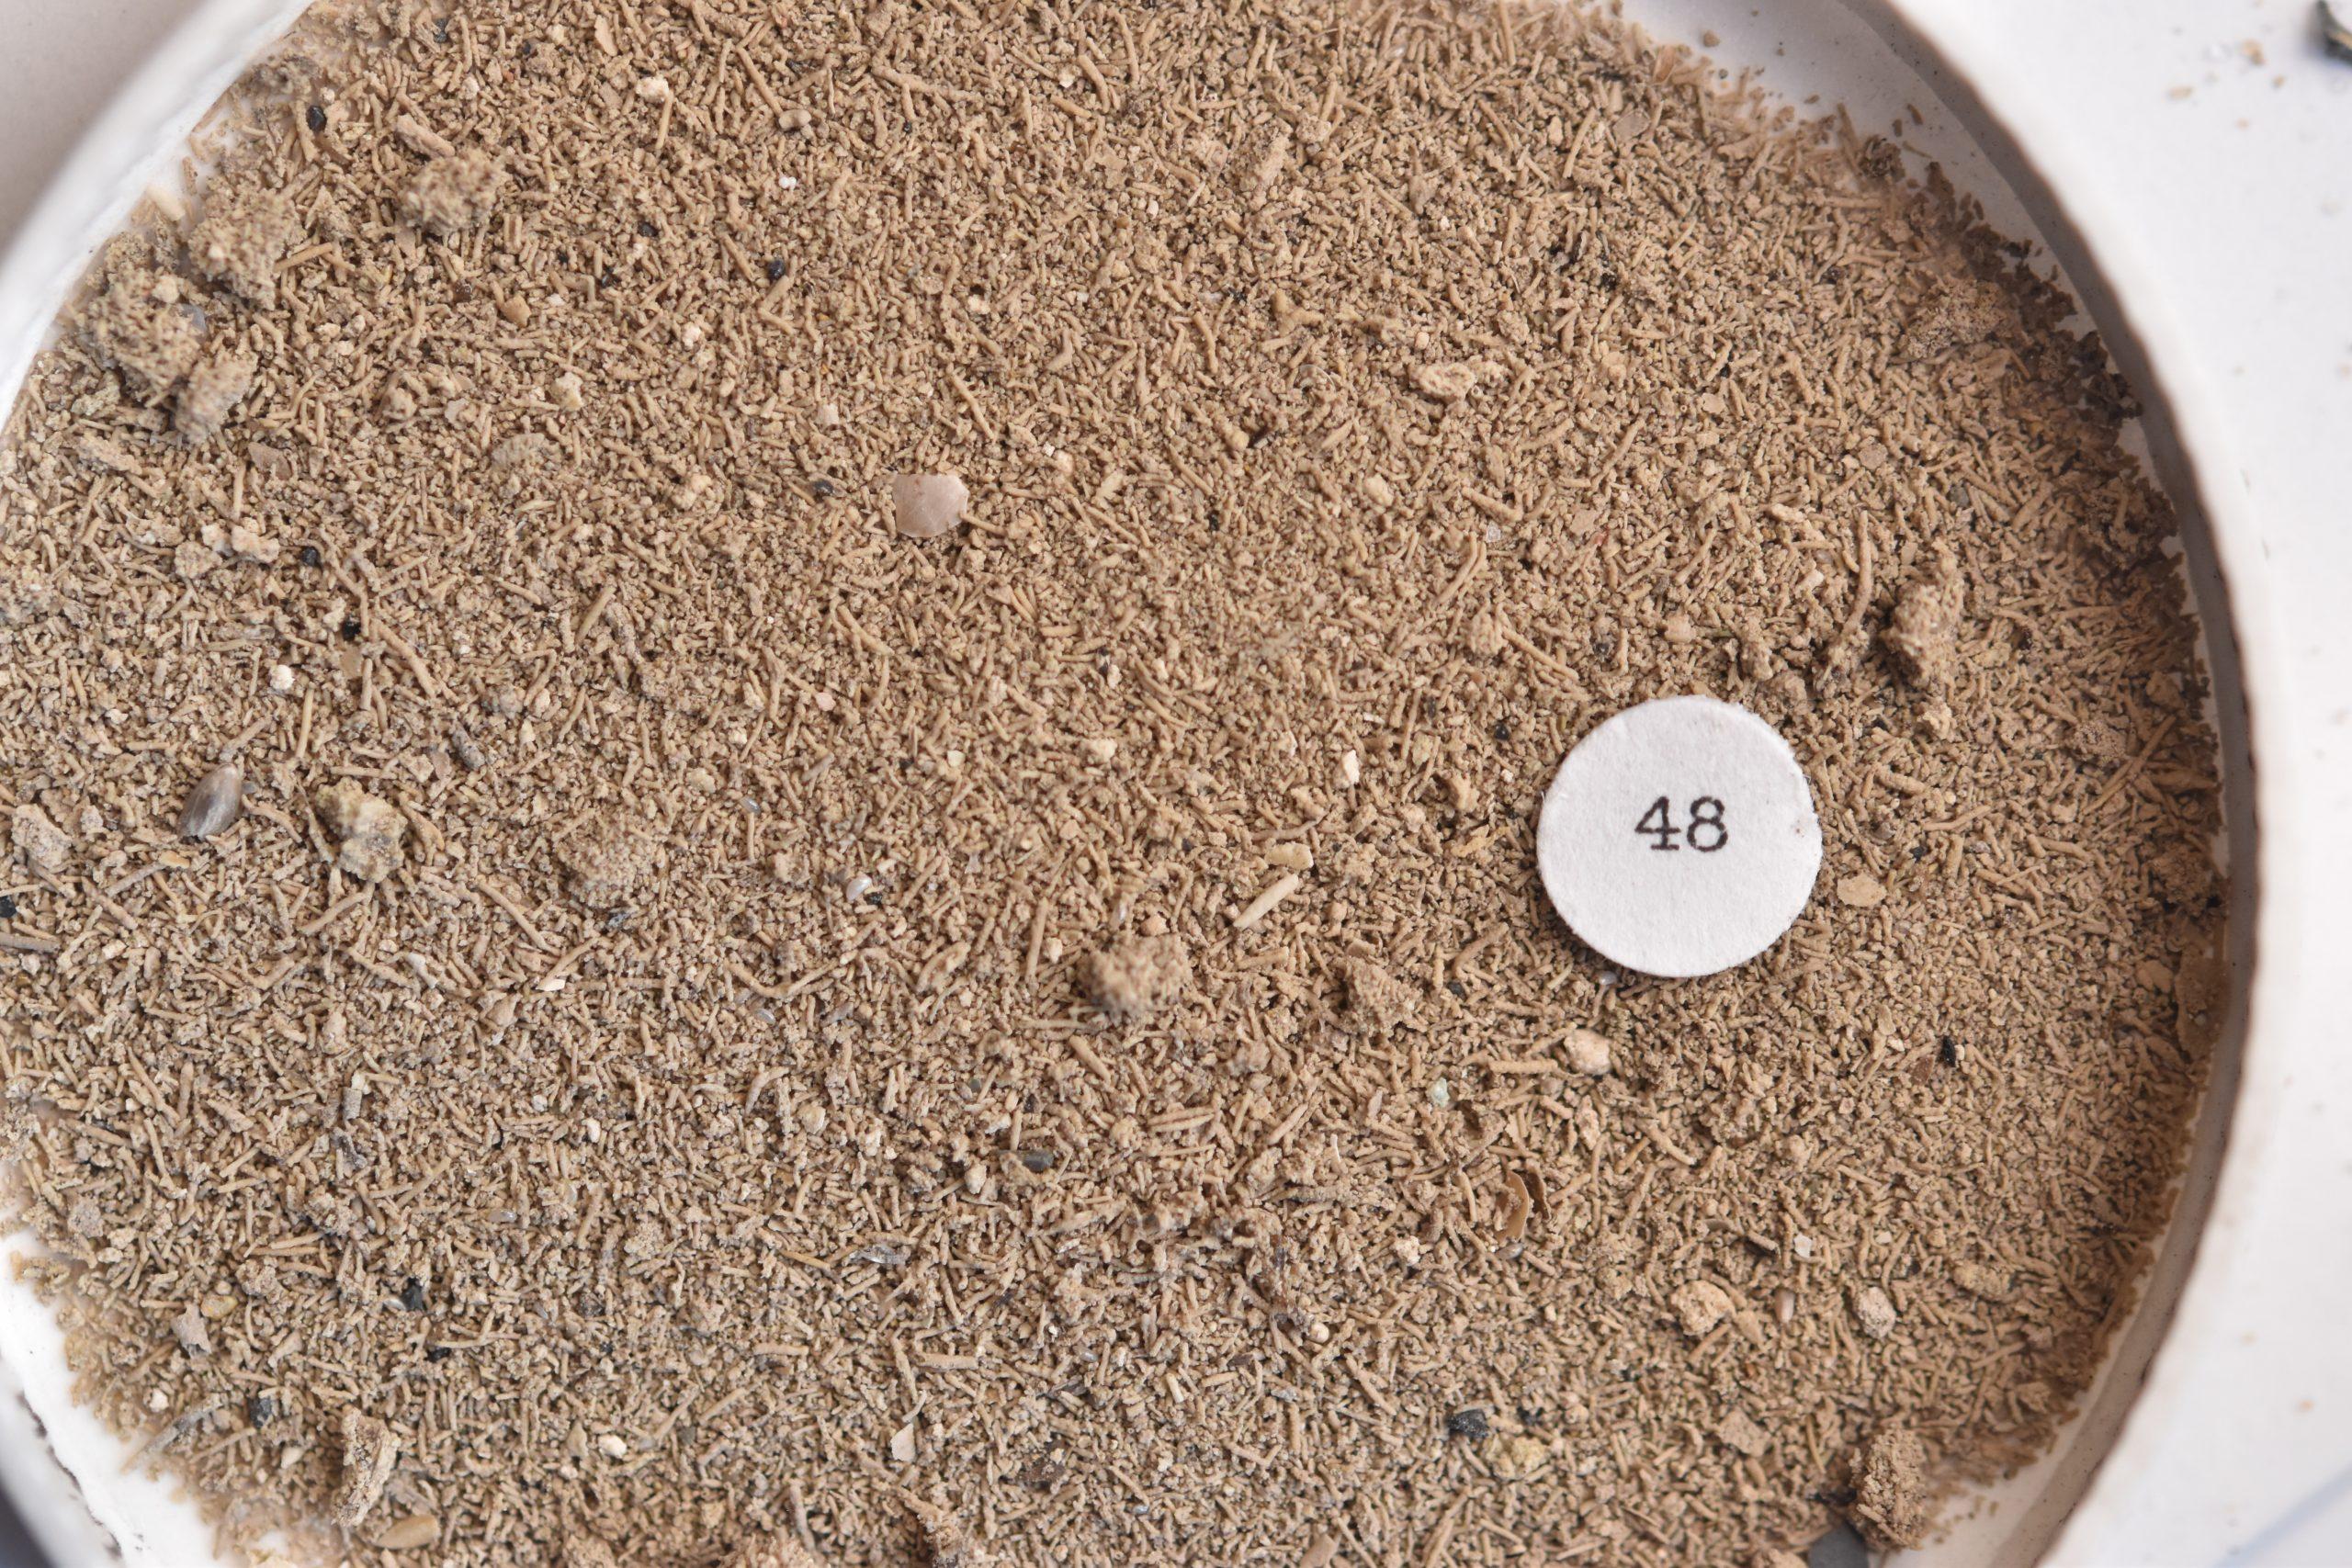 Spearfish Canyon Sand